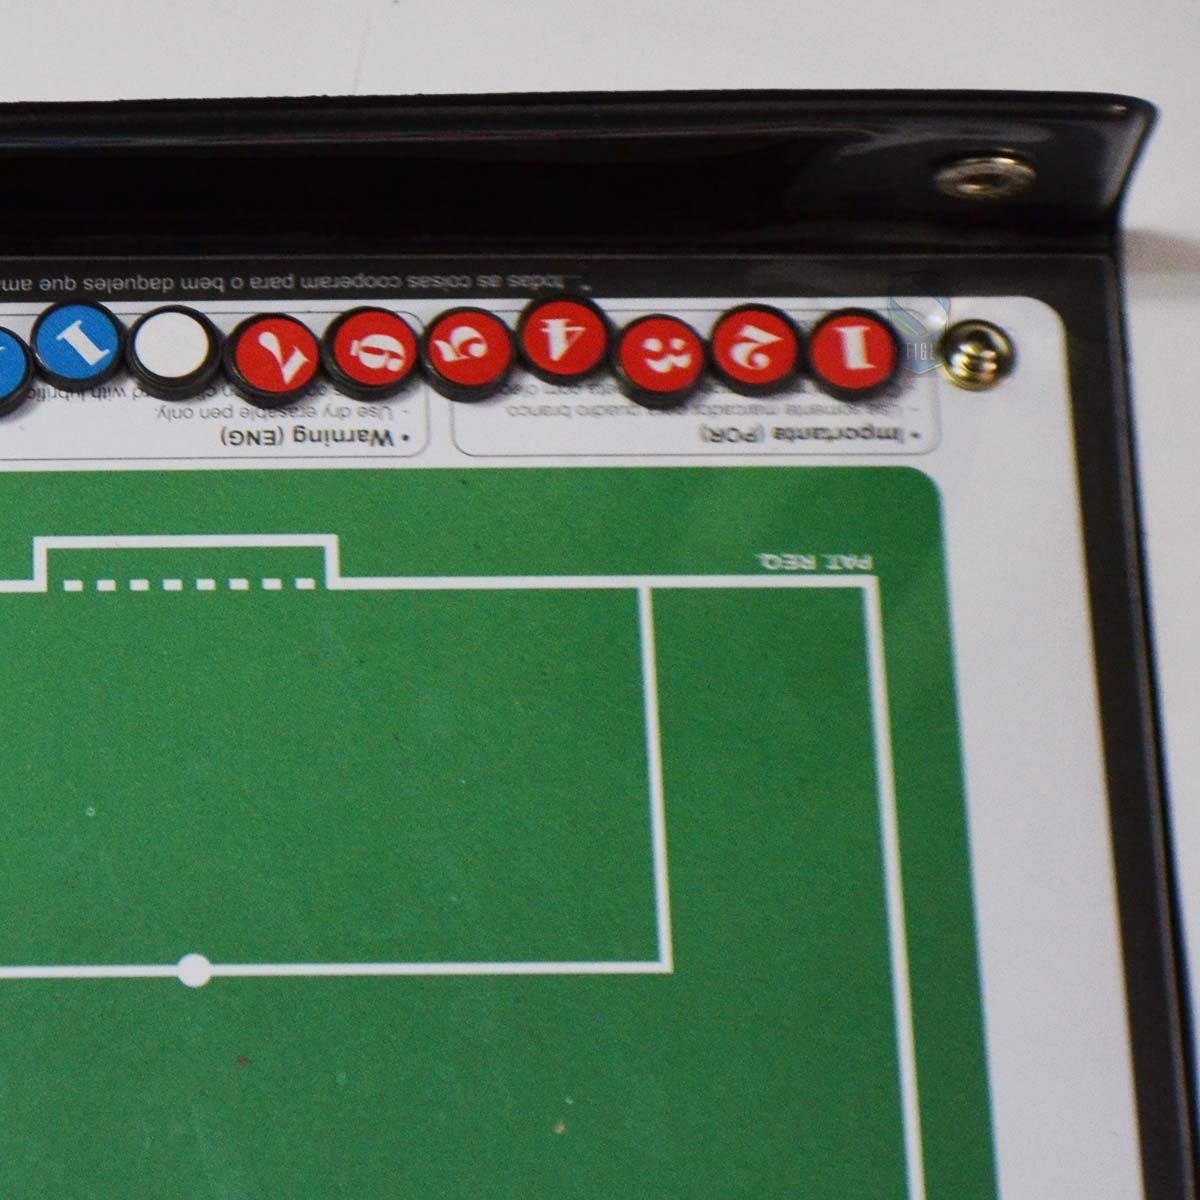 ... Prancheta Tática Magnética Futebol Society Kief - Imã Caneta ... 2754ac4d84ab3